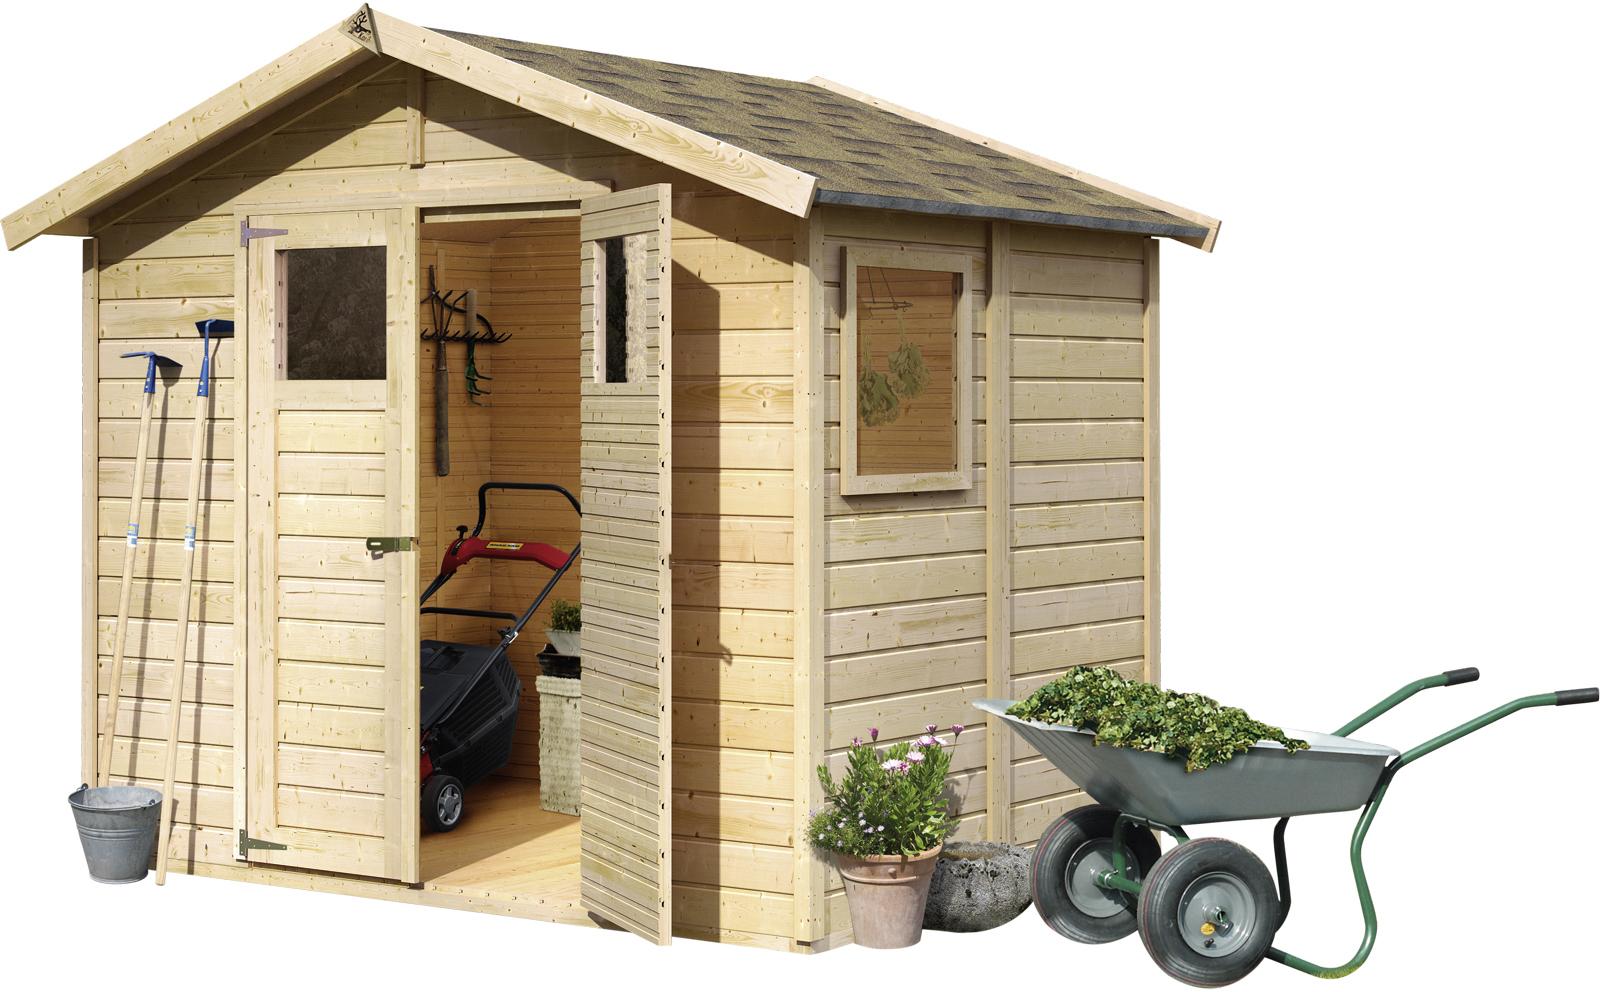 gartenhaus dalin 1 14 mm 2 45 x 1 8 m. Black Bedroom Furniture Sets. Home Design Ideas